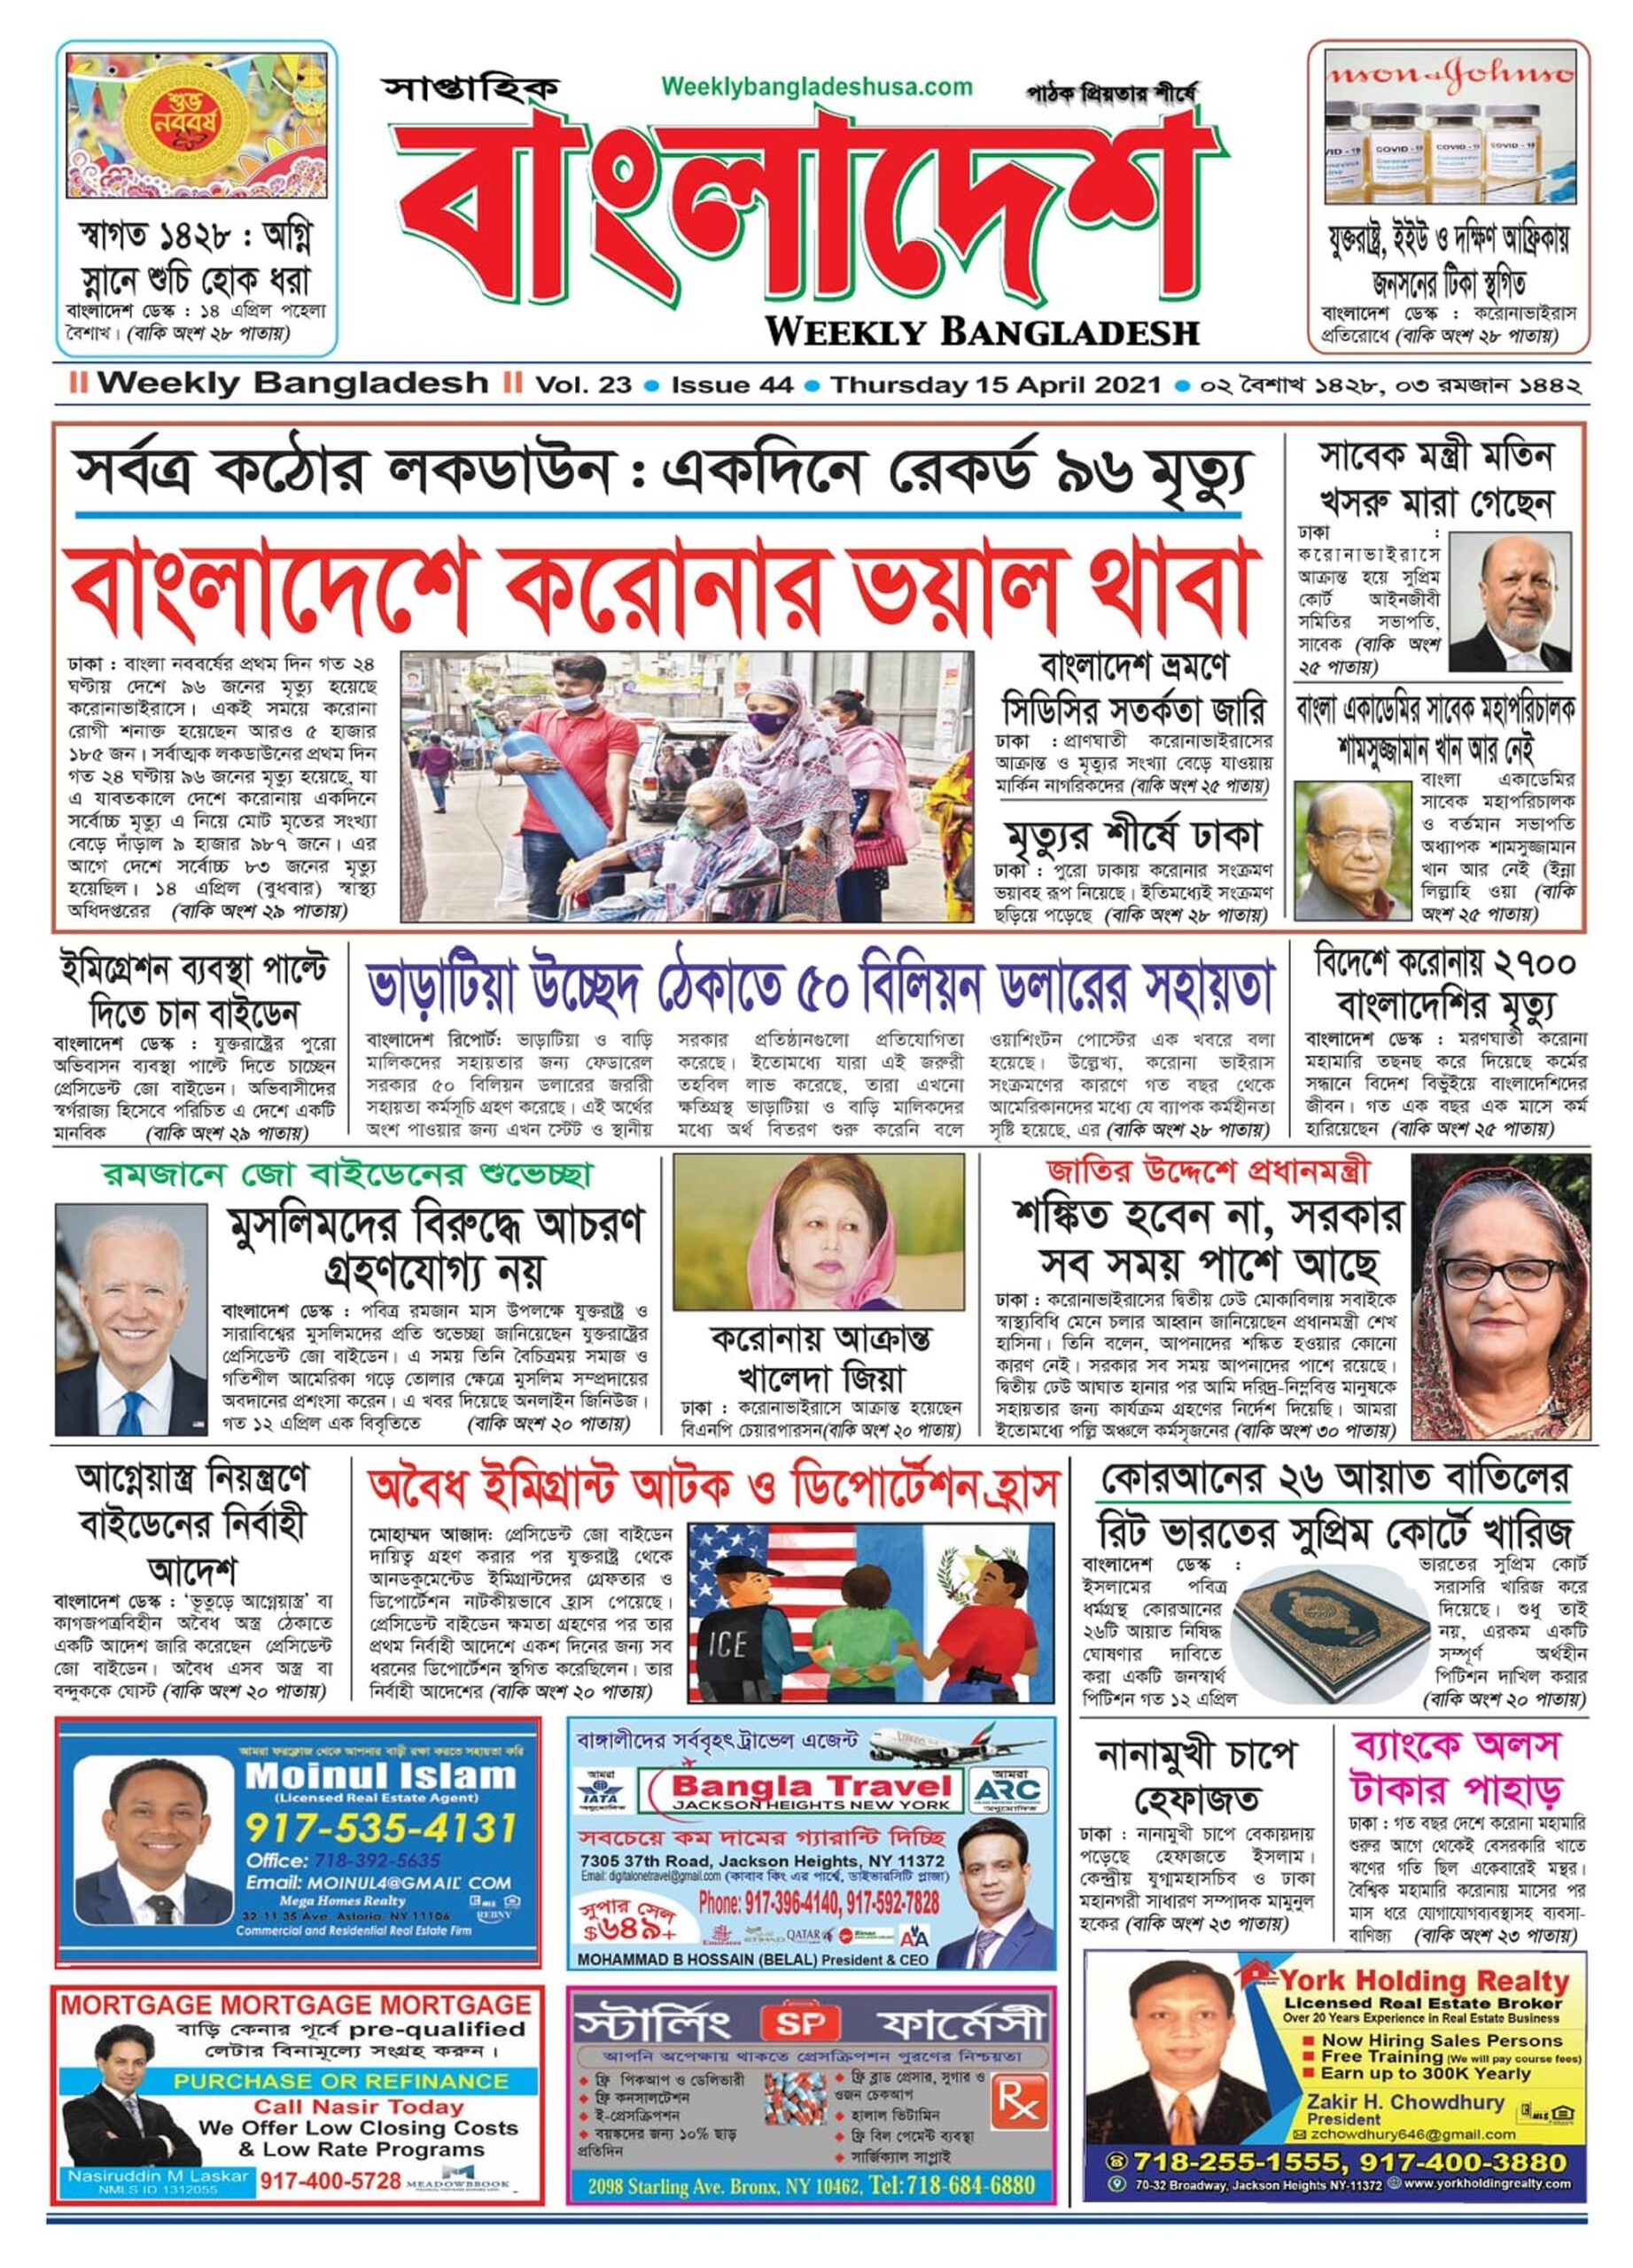 VOL 23, ISSUE 44, 15 April 2021